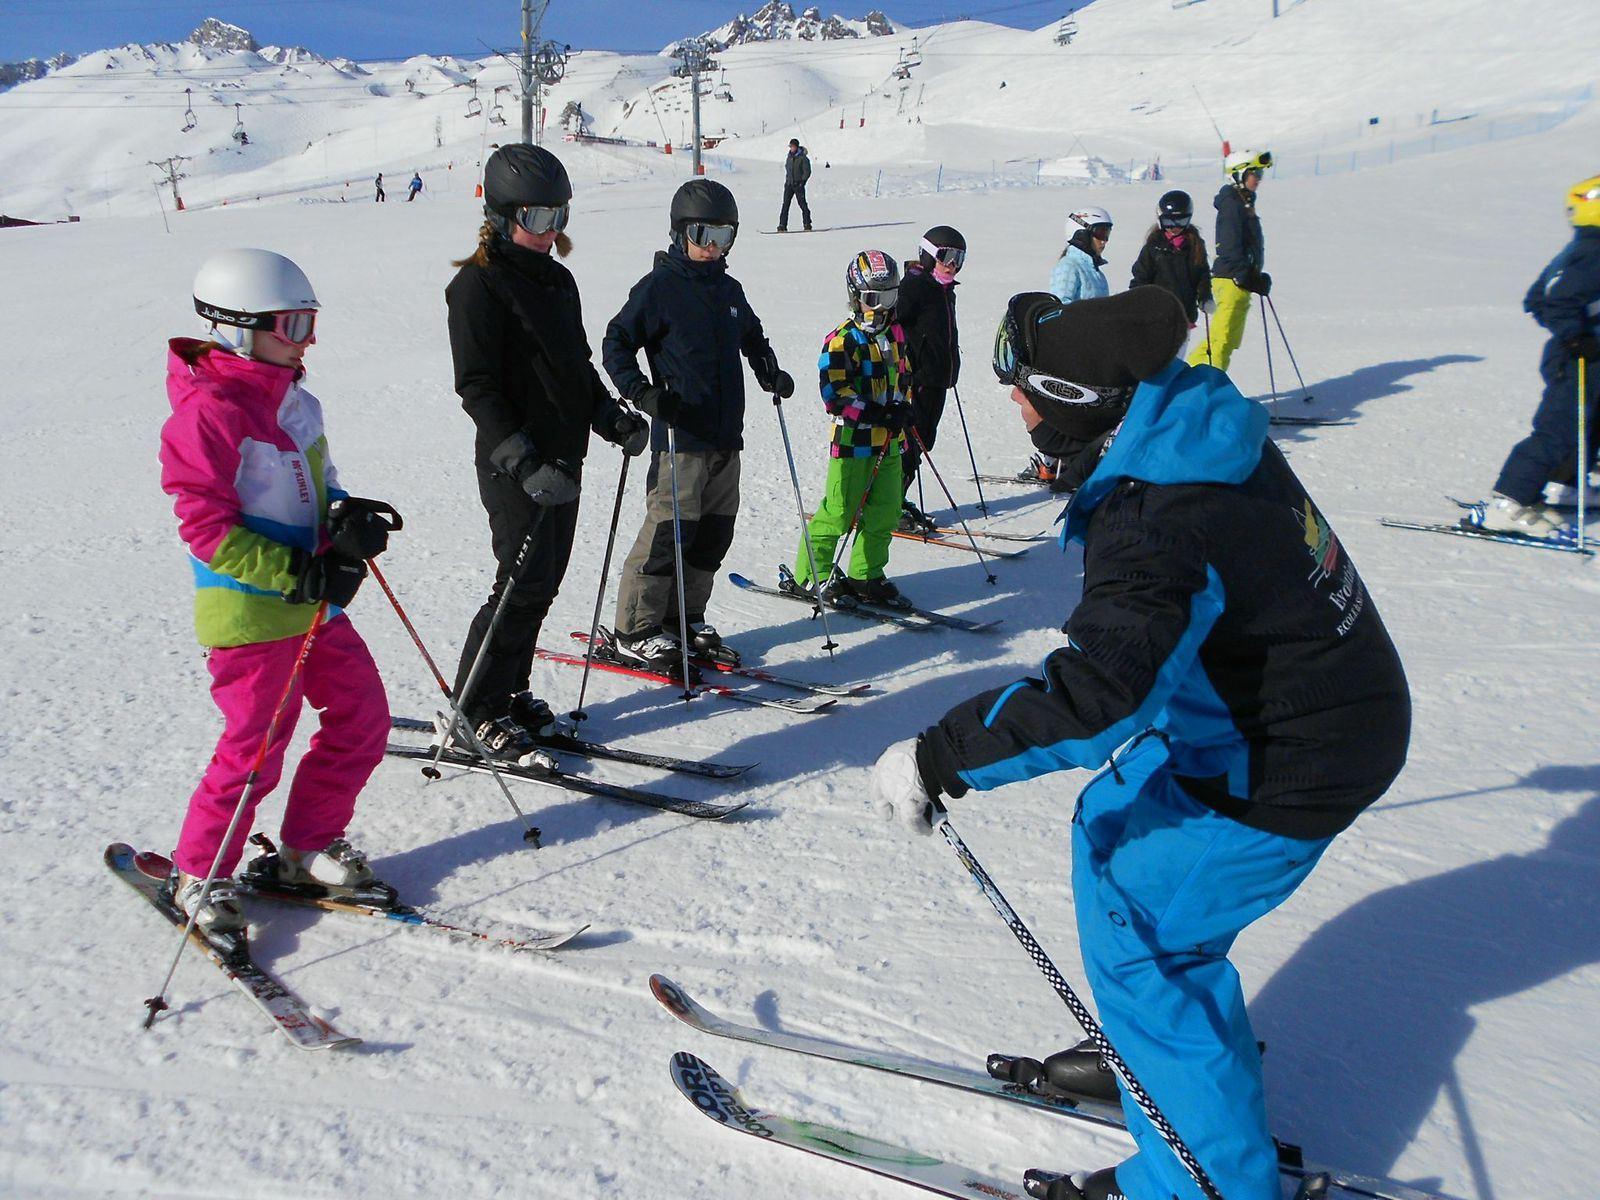 Morning ski lessons for kids and adults- Ski school Evolution 2